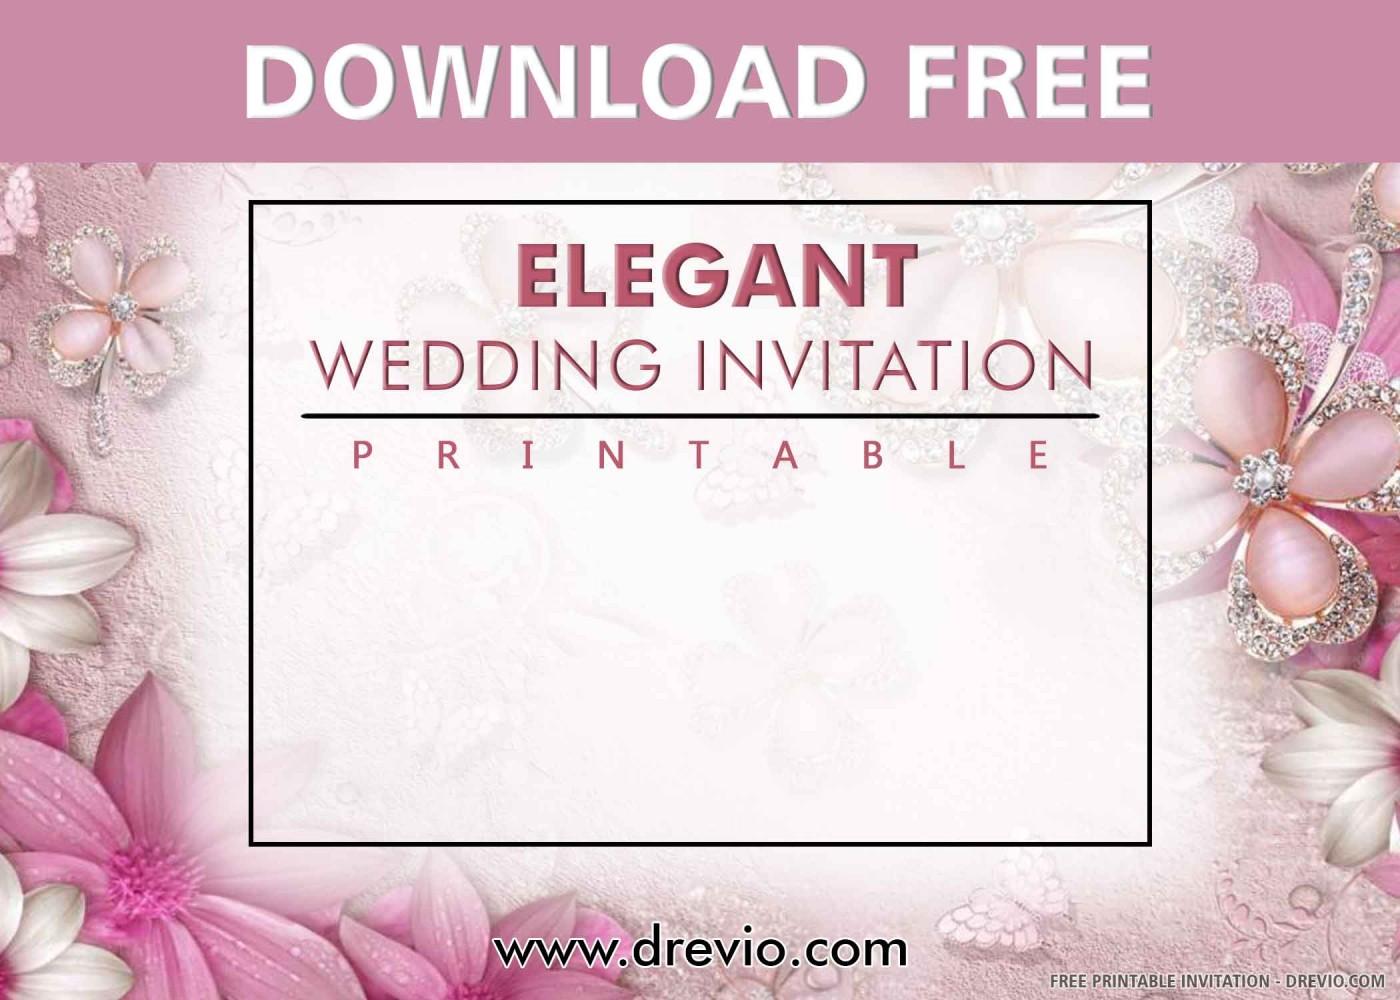 006 Stunning Printable Wedding Invitation Template Example  Free For Microsoft Word Vintage1400